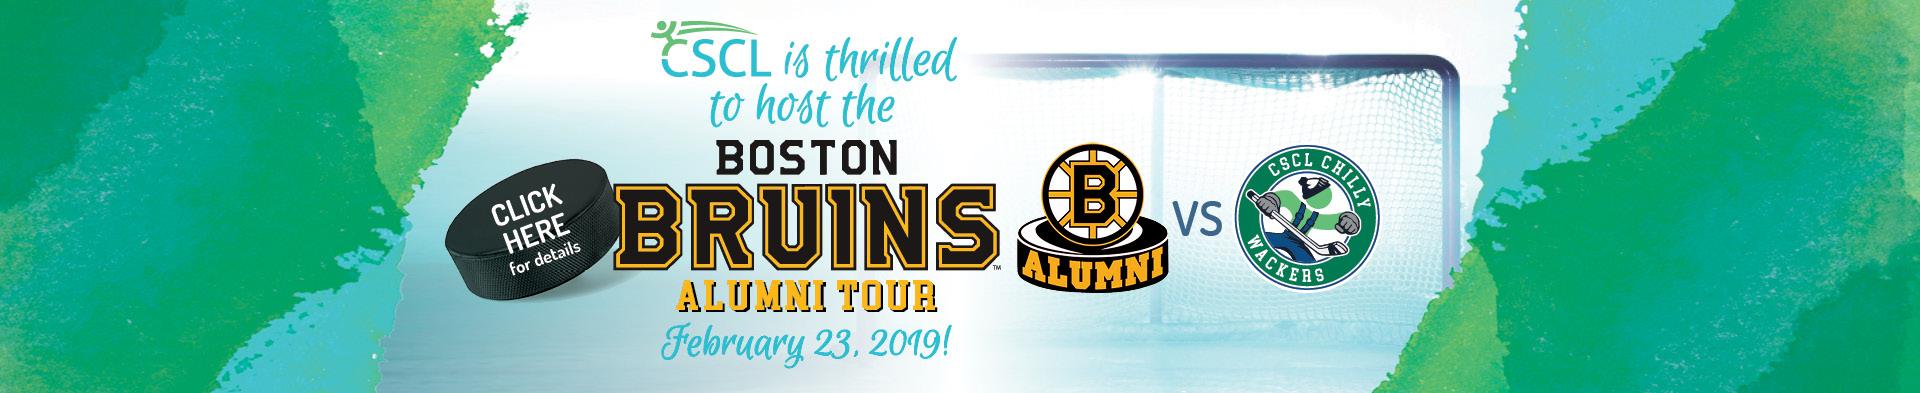 CSCL Hockey Series - Boston Bruins